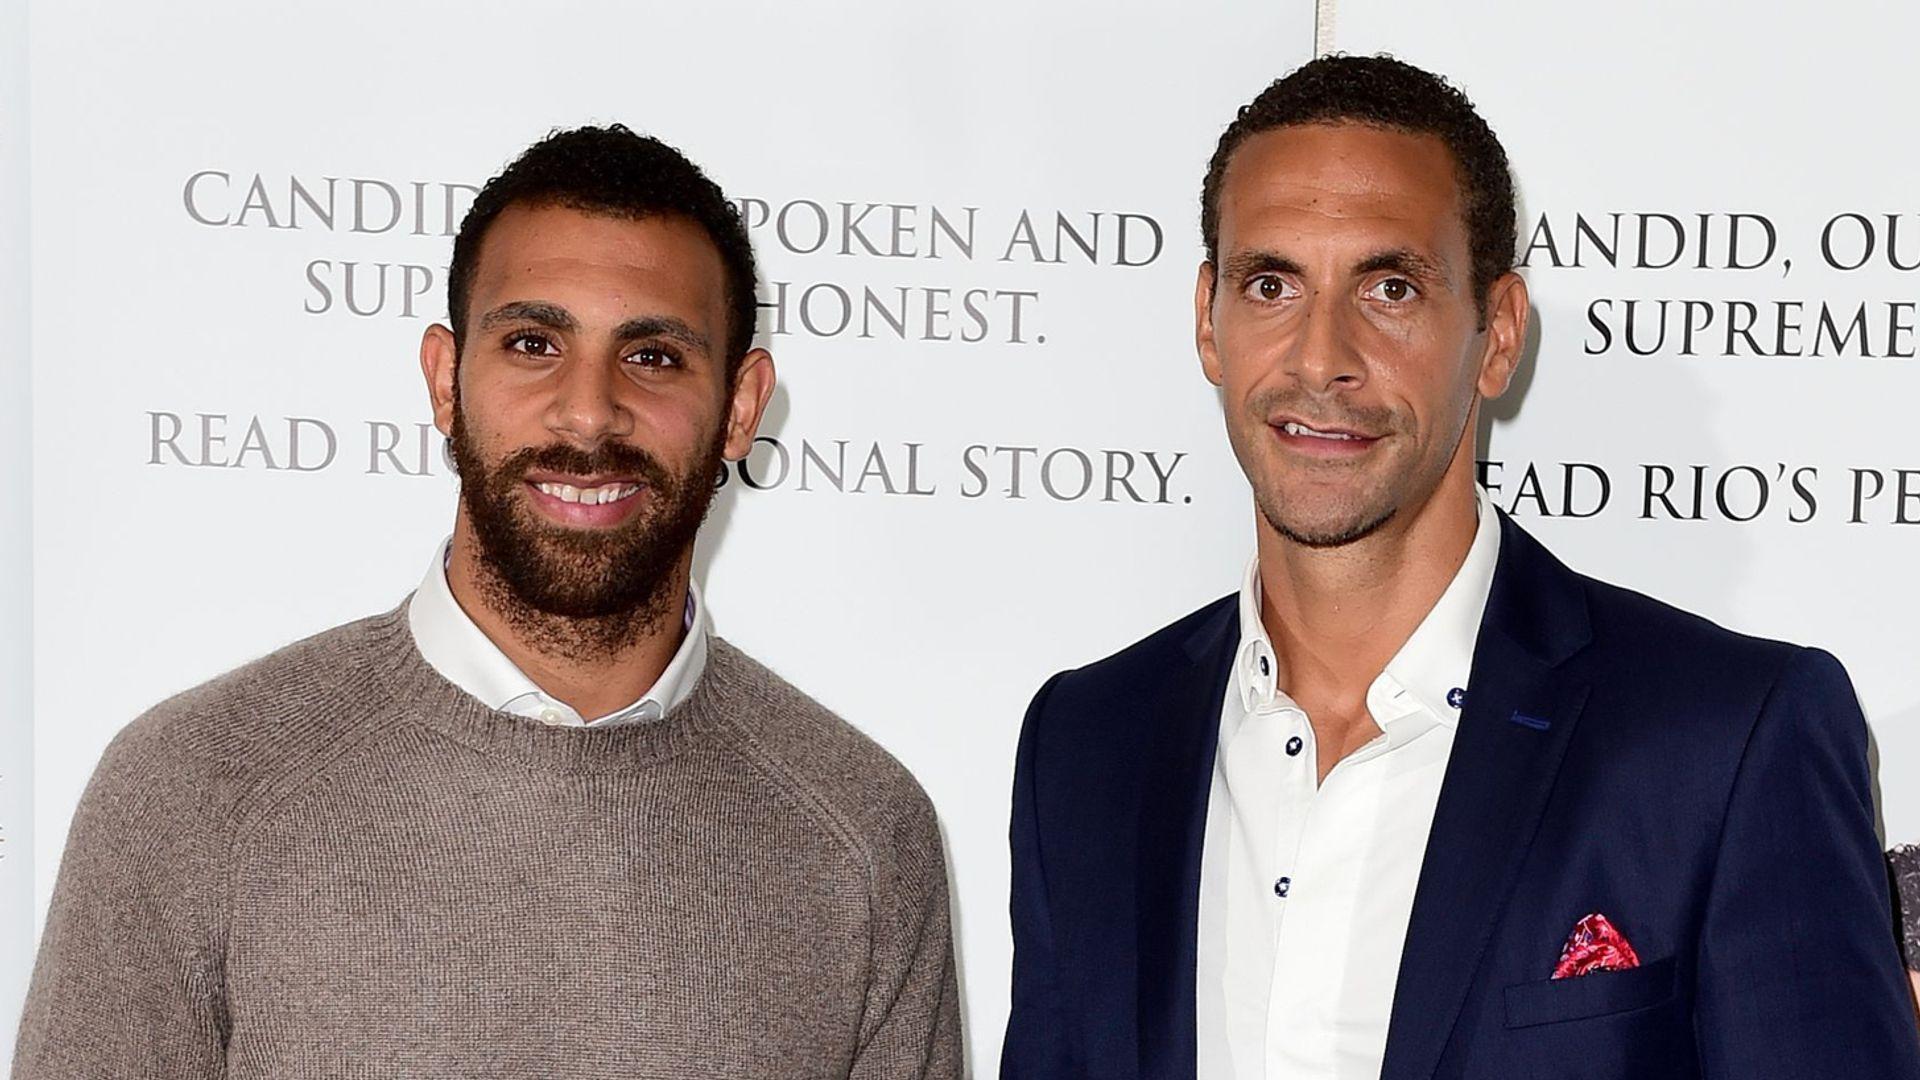 Rio and Anton Ferdinand back West Ham takeover bid